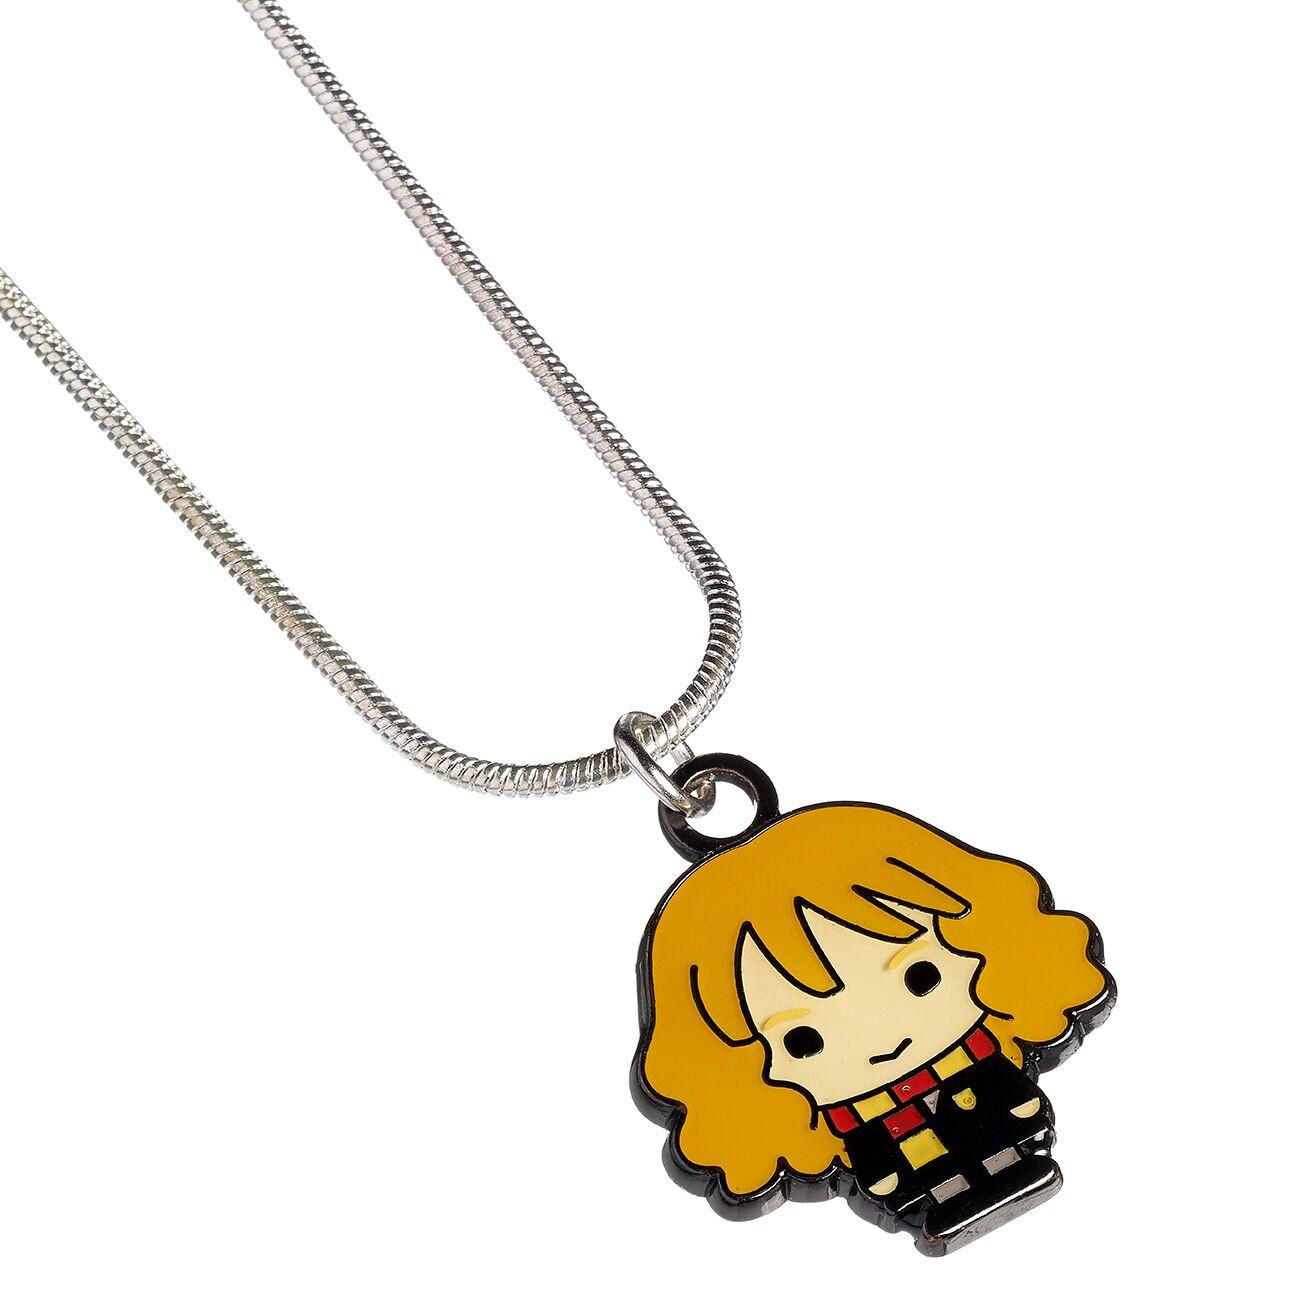 Hermione Granger Chibi Necklace